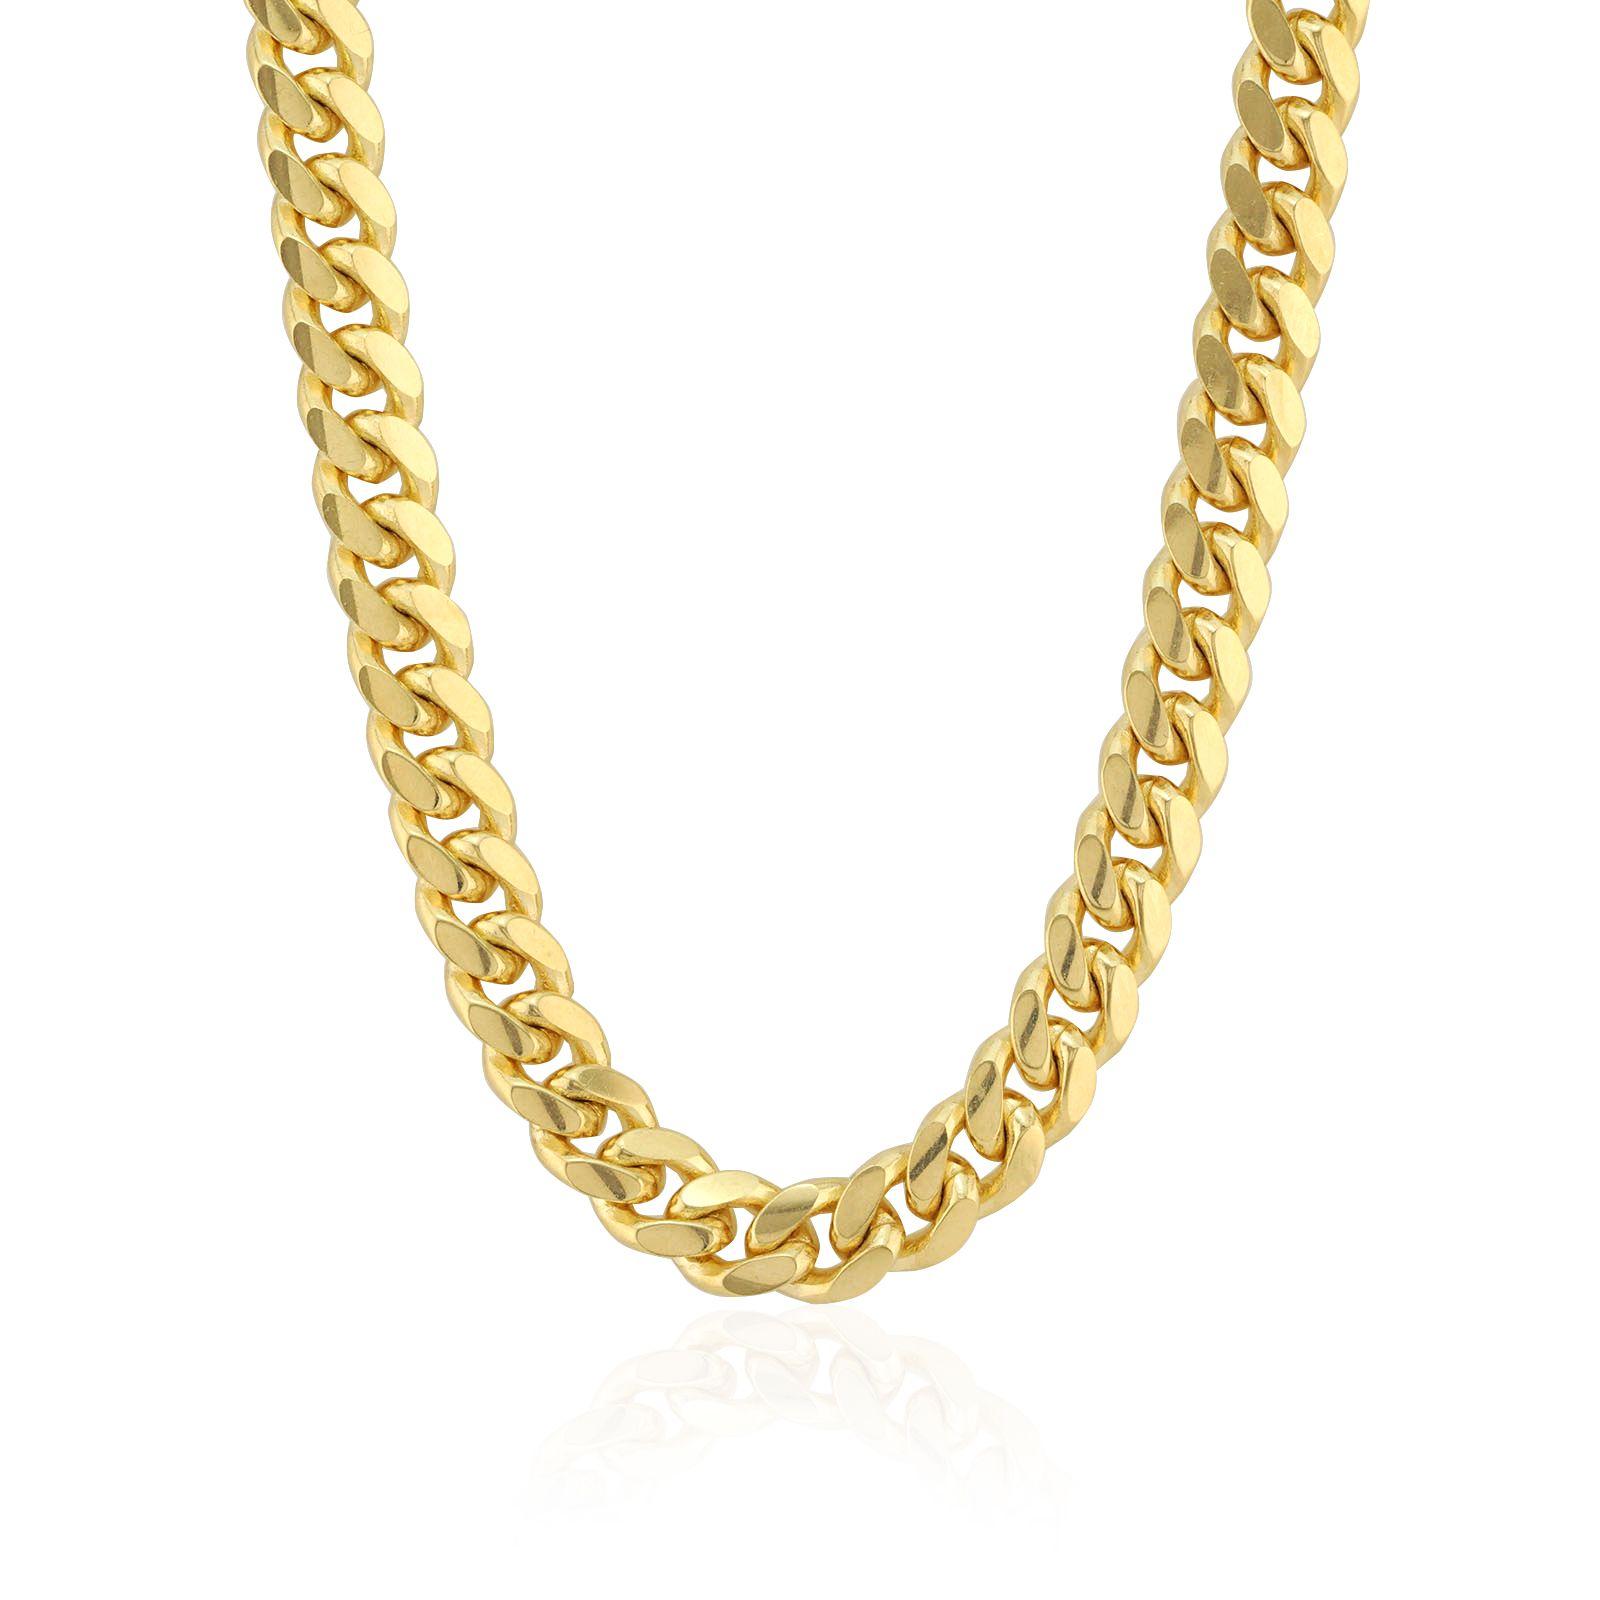 Solid 14k Yellow Gold 2 6mm Miami Cuban Chain 18 20 22 24 26 28 30 Wjd Exclusives Cuban Chain Chain Yellow Gold